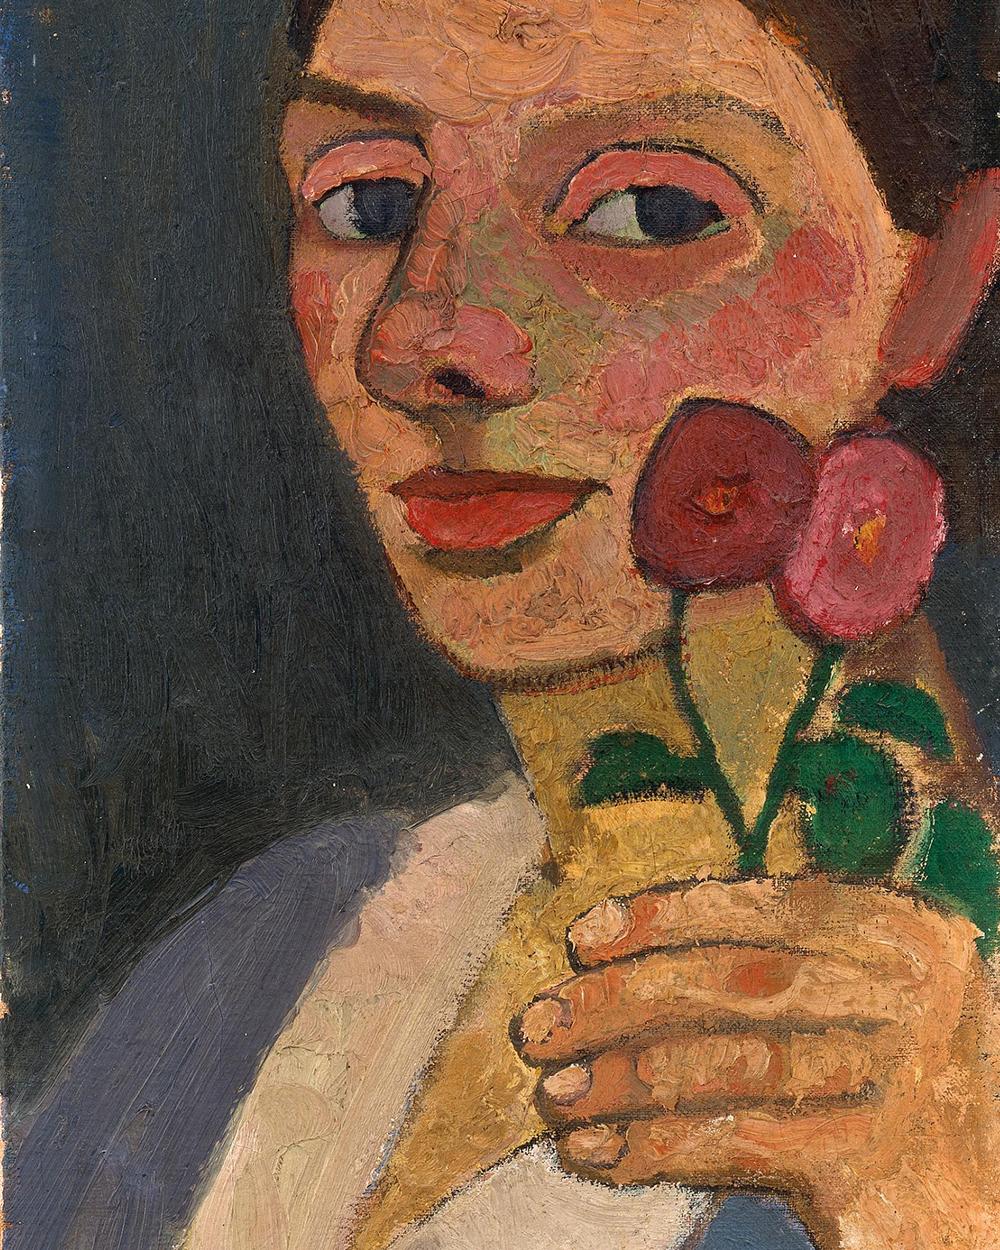 Paula Modersohn-Becker (German, 1876-1907). Selbstbildnis mit zwei Blumen in der erhobenen linken Hand [Self-Portrait with Two Flowers in her Raised Left Hand]. 1907. Oil on canvas. 21 3/4 x 9 6/8 in. (55 x 25 cm). The Museum of Modern Art, Gift of Debra and Leon Black, and The Neue Galerie, Gift of Ronald S. Lauder.